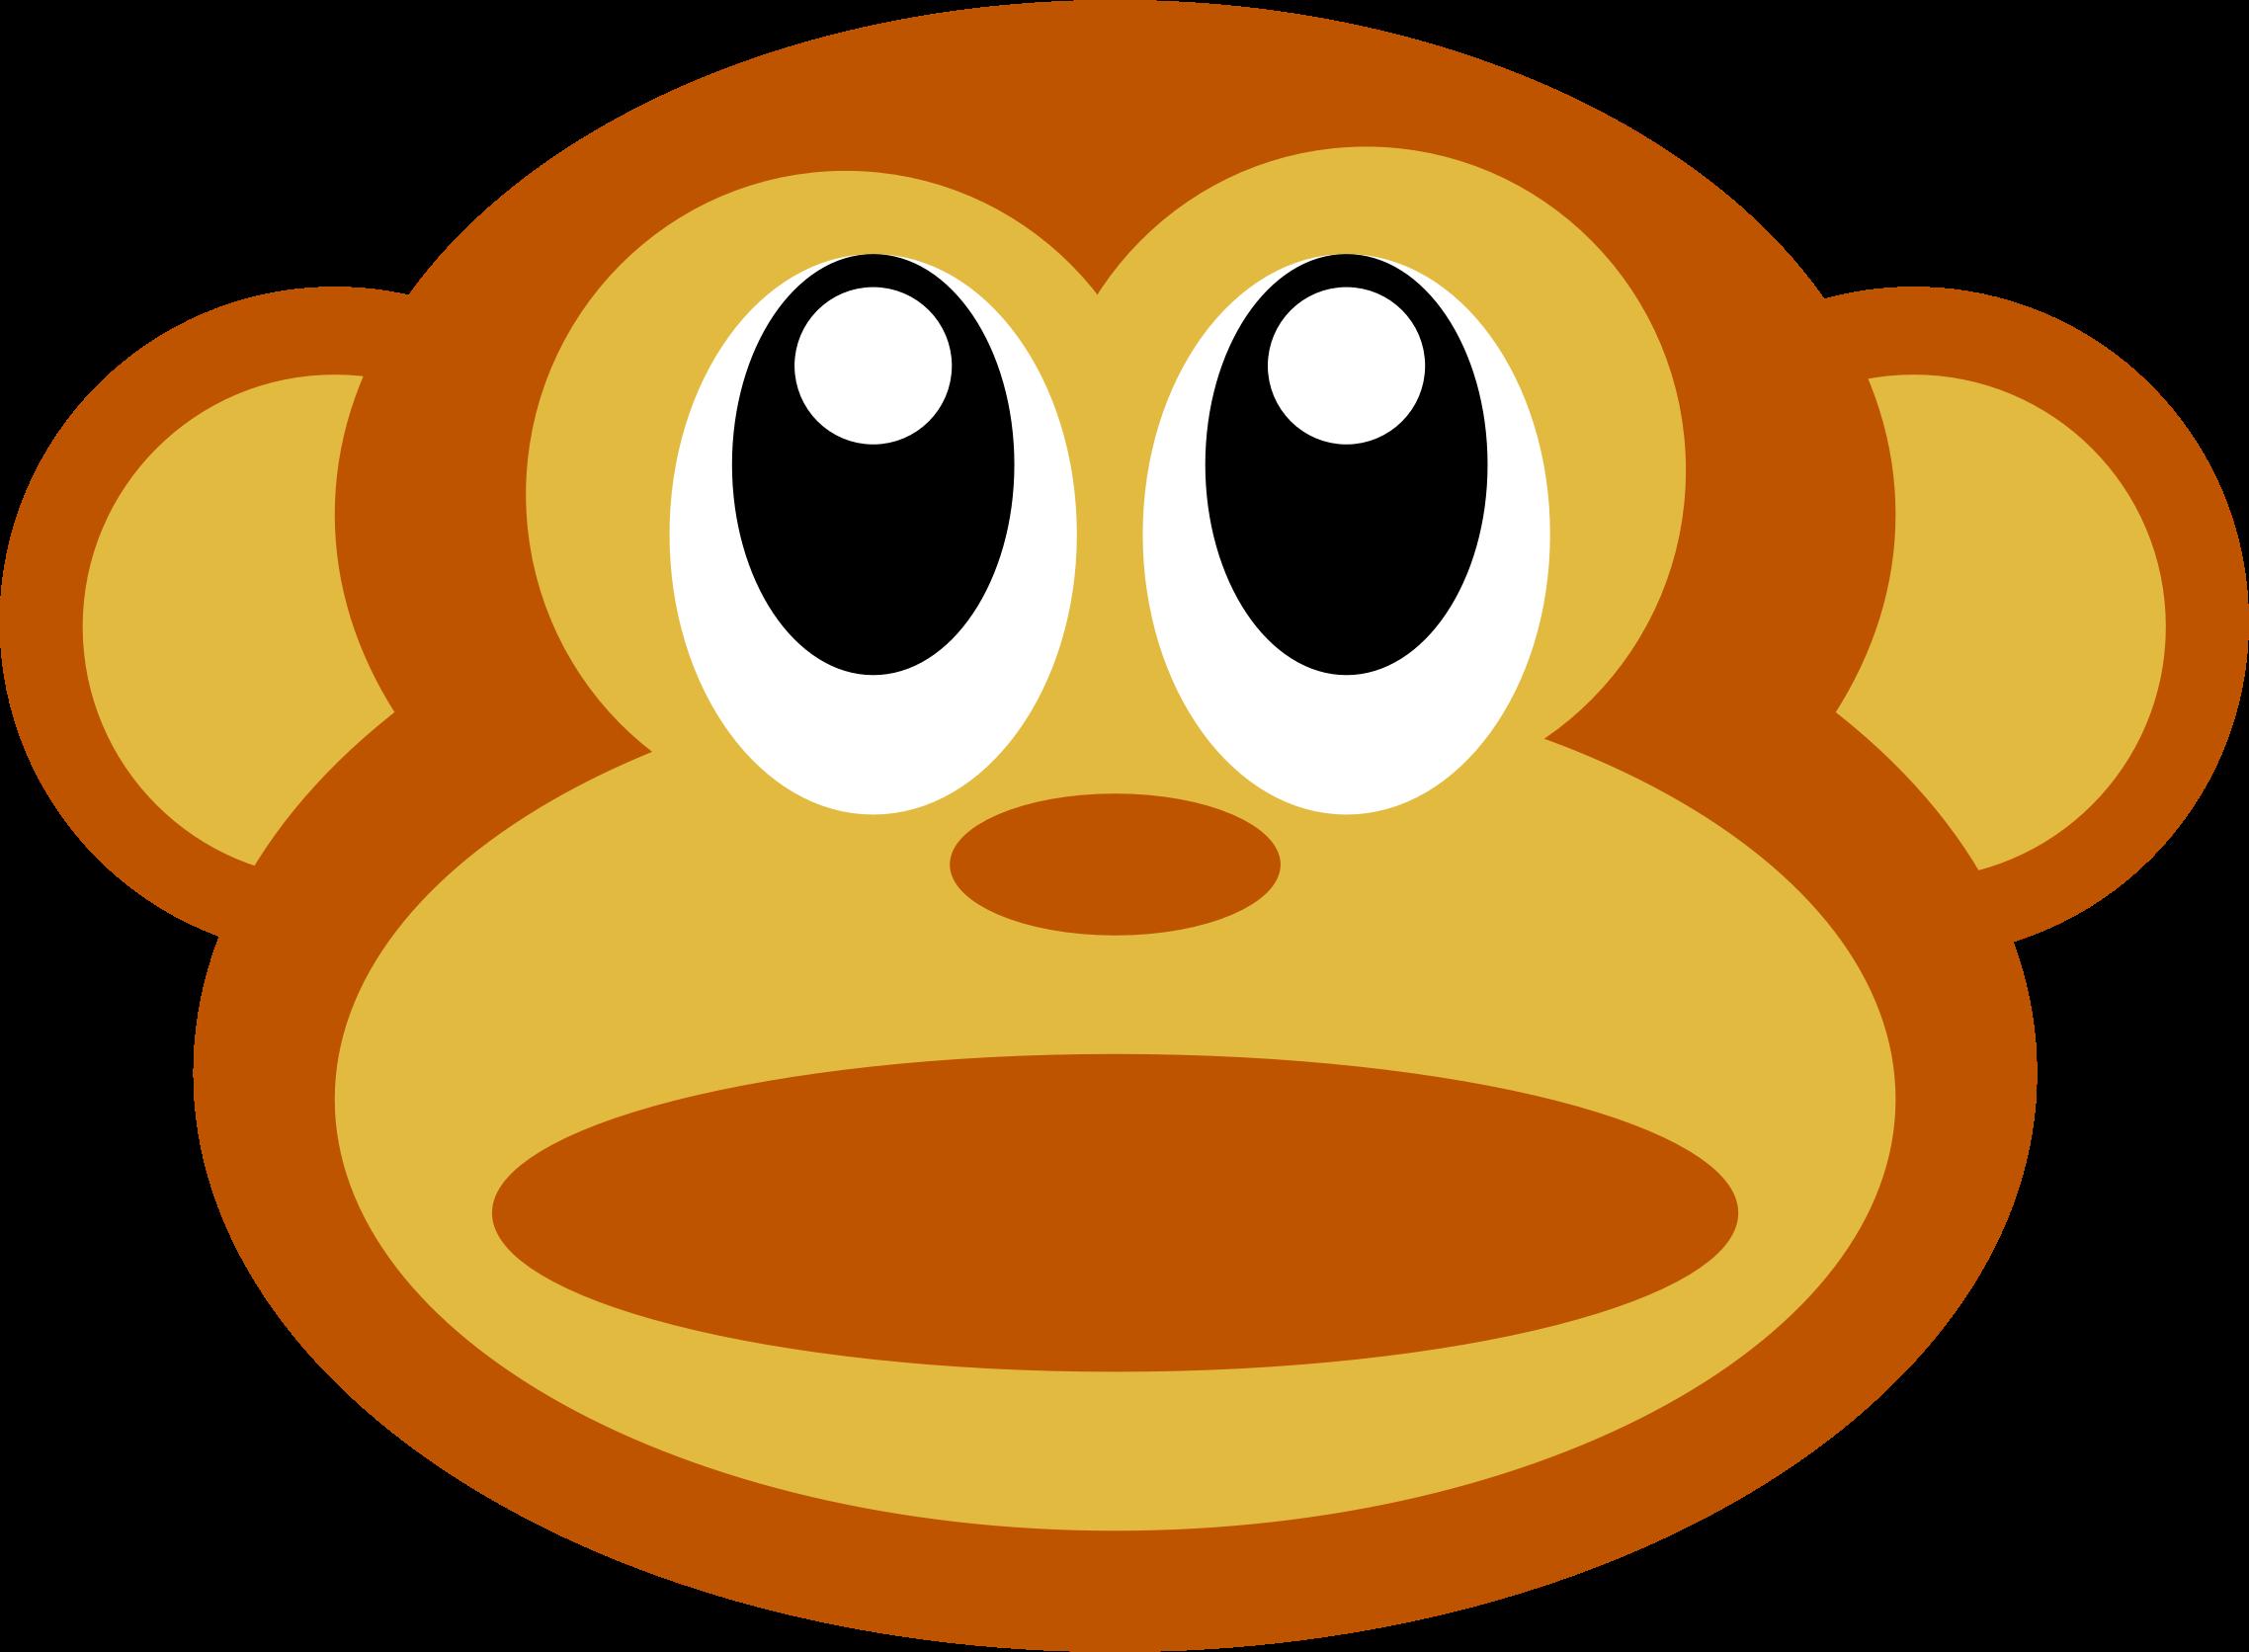 clipart monkey face - photo #43